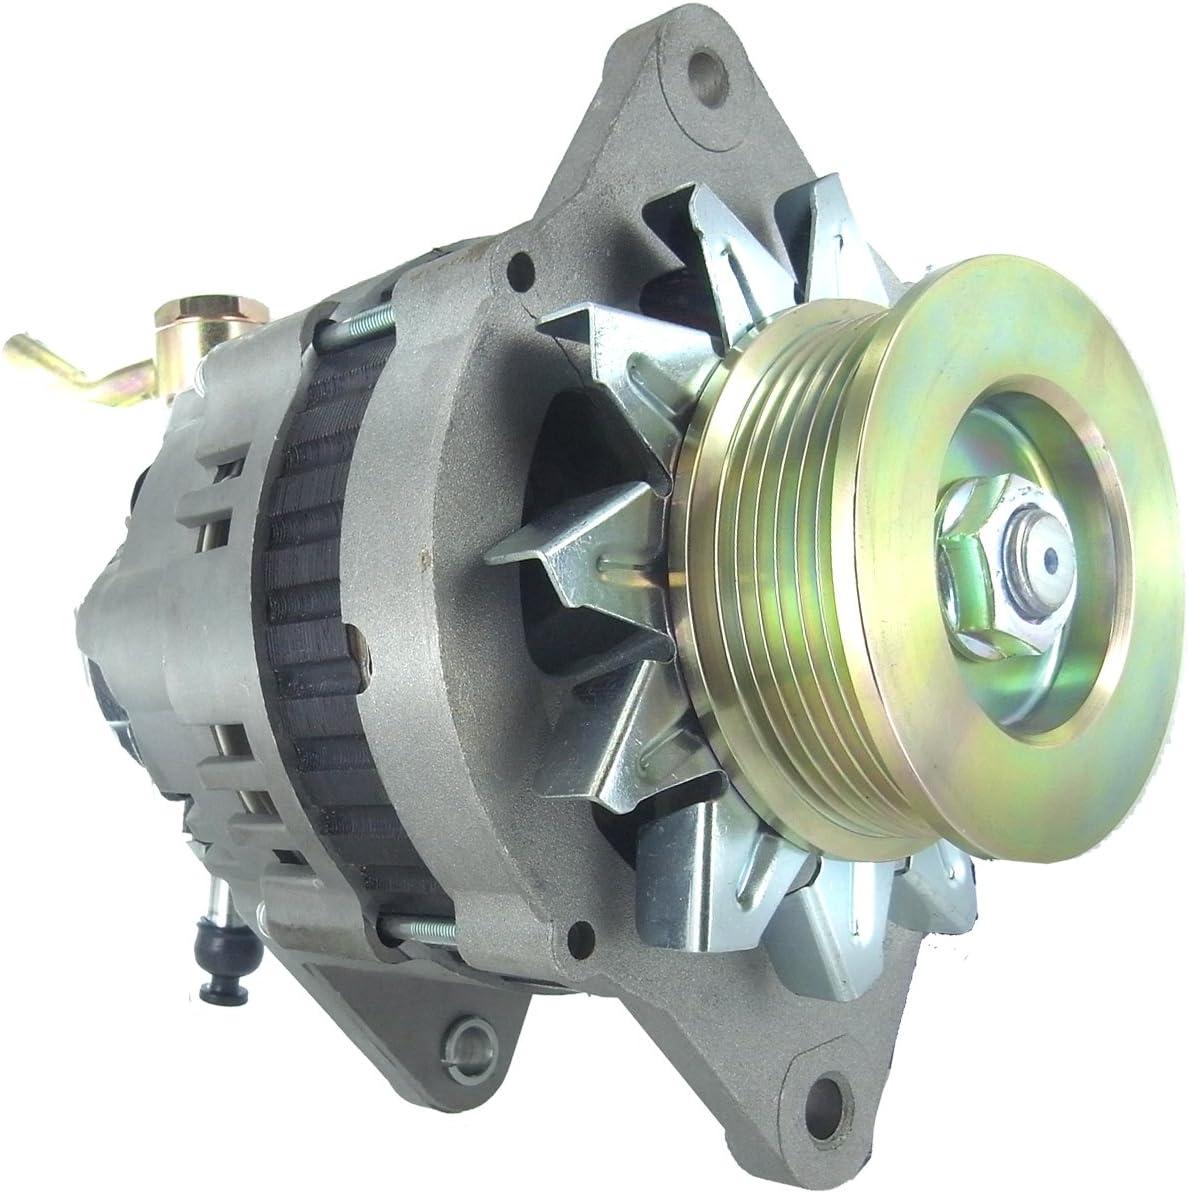 NEW ALTERNATOR GM 5.7 5.7L V8 ISUZU TRUCK NPR MODELS 93 94 95 96 97 8970370640